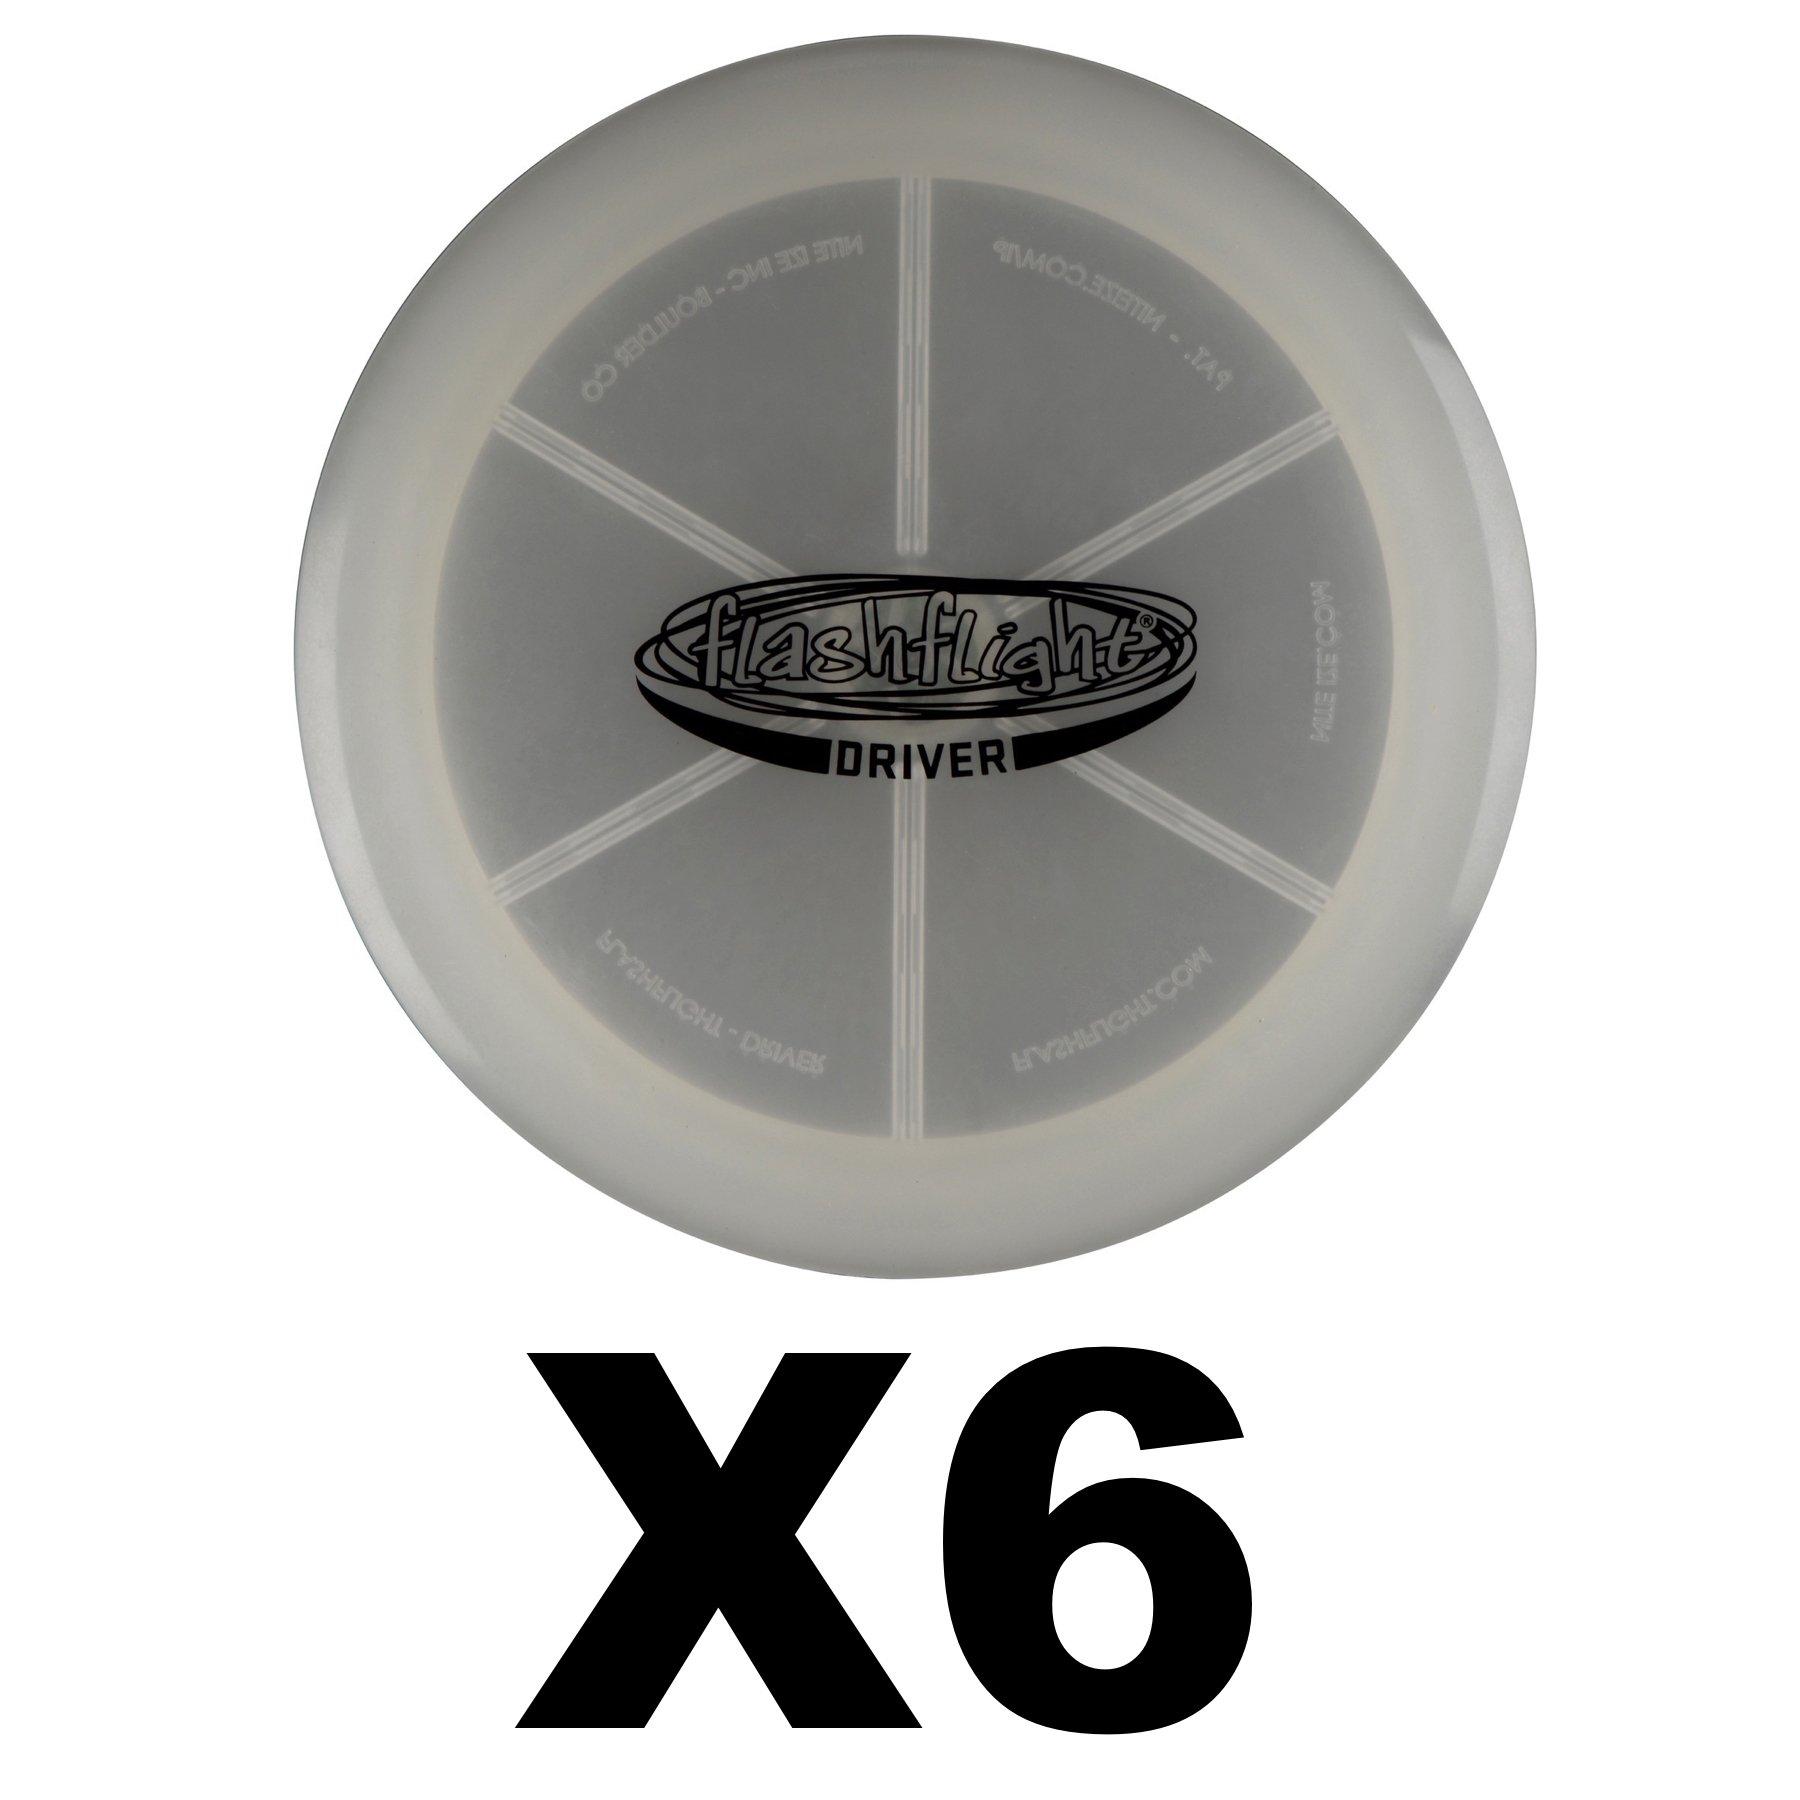 Nite Ize Flashflight LED Disc Golf Disco Driver Light-Up Frisbee Golf (6-Pack)